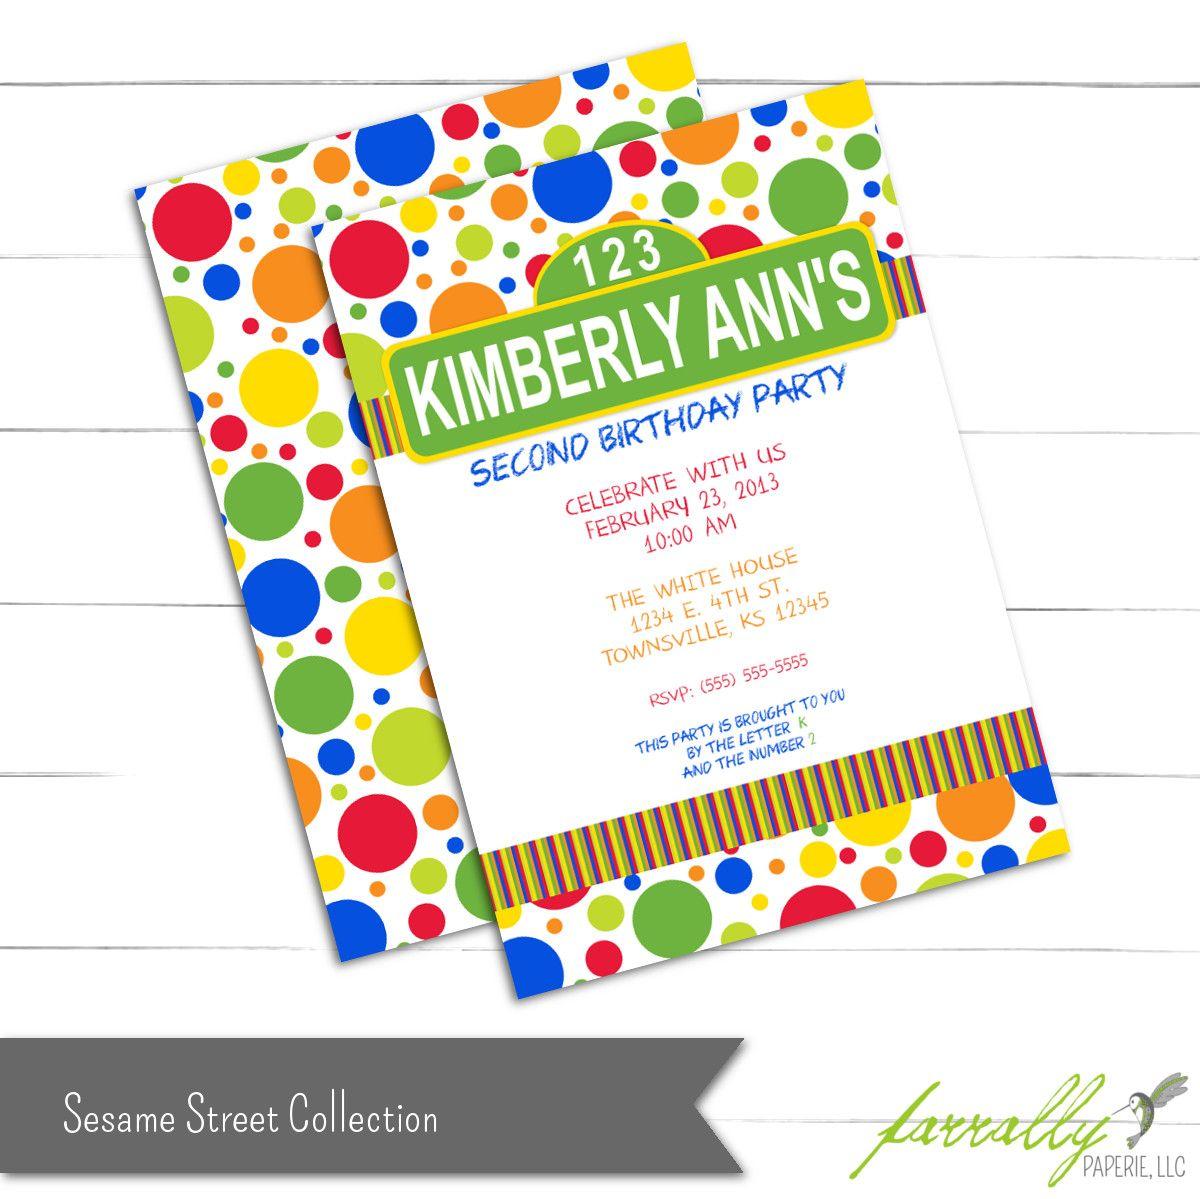 Hand Made Sesame Street Birthday Invitation by Farrally Paperie, LLC ...